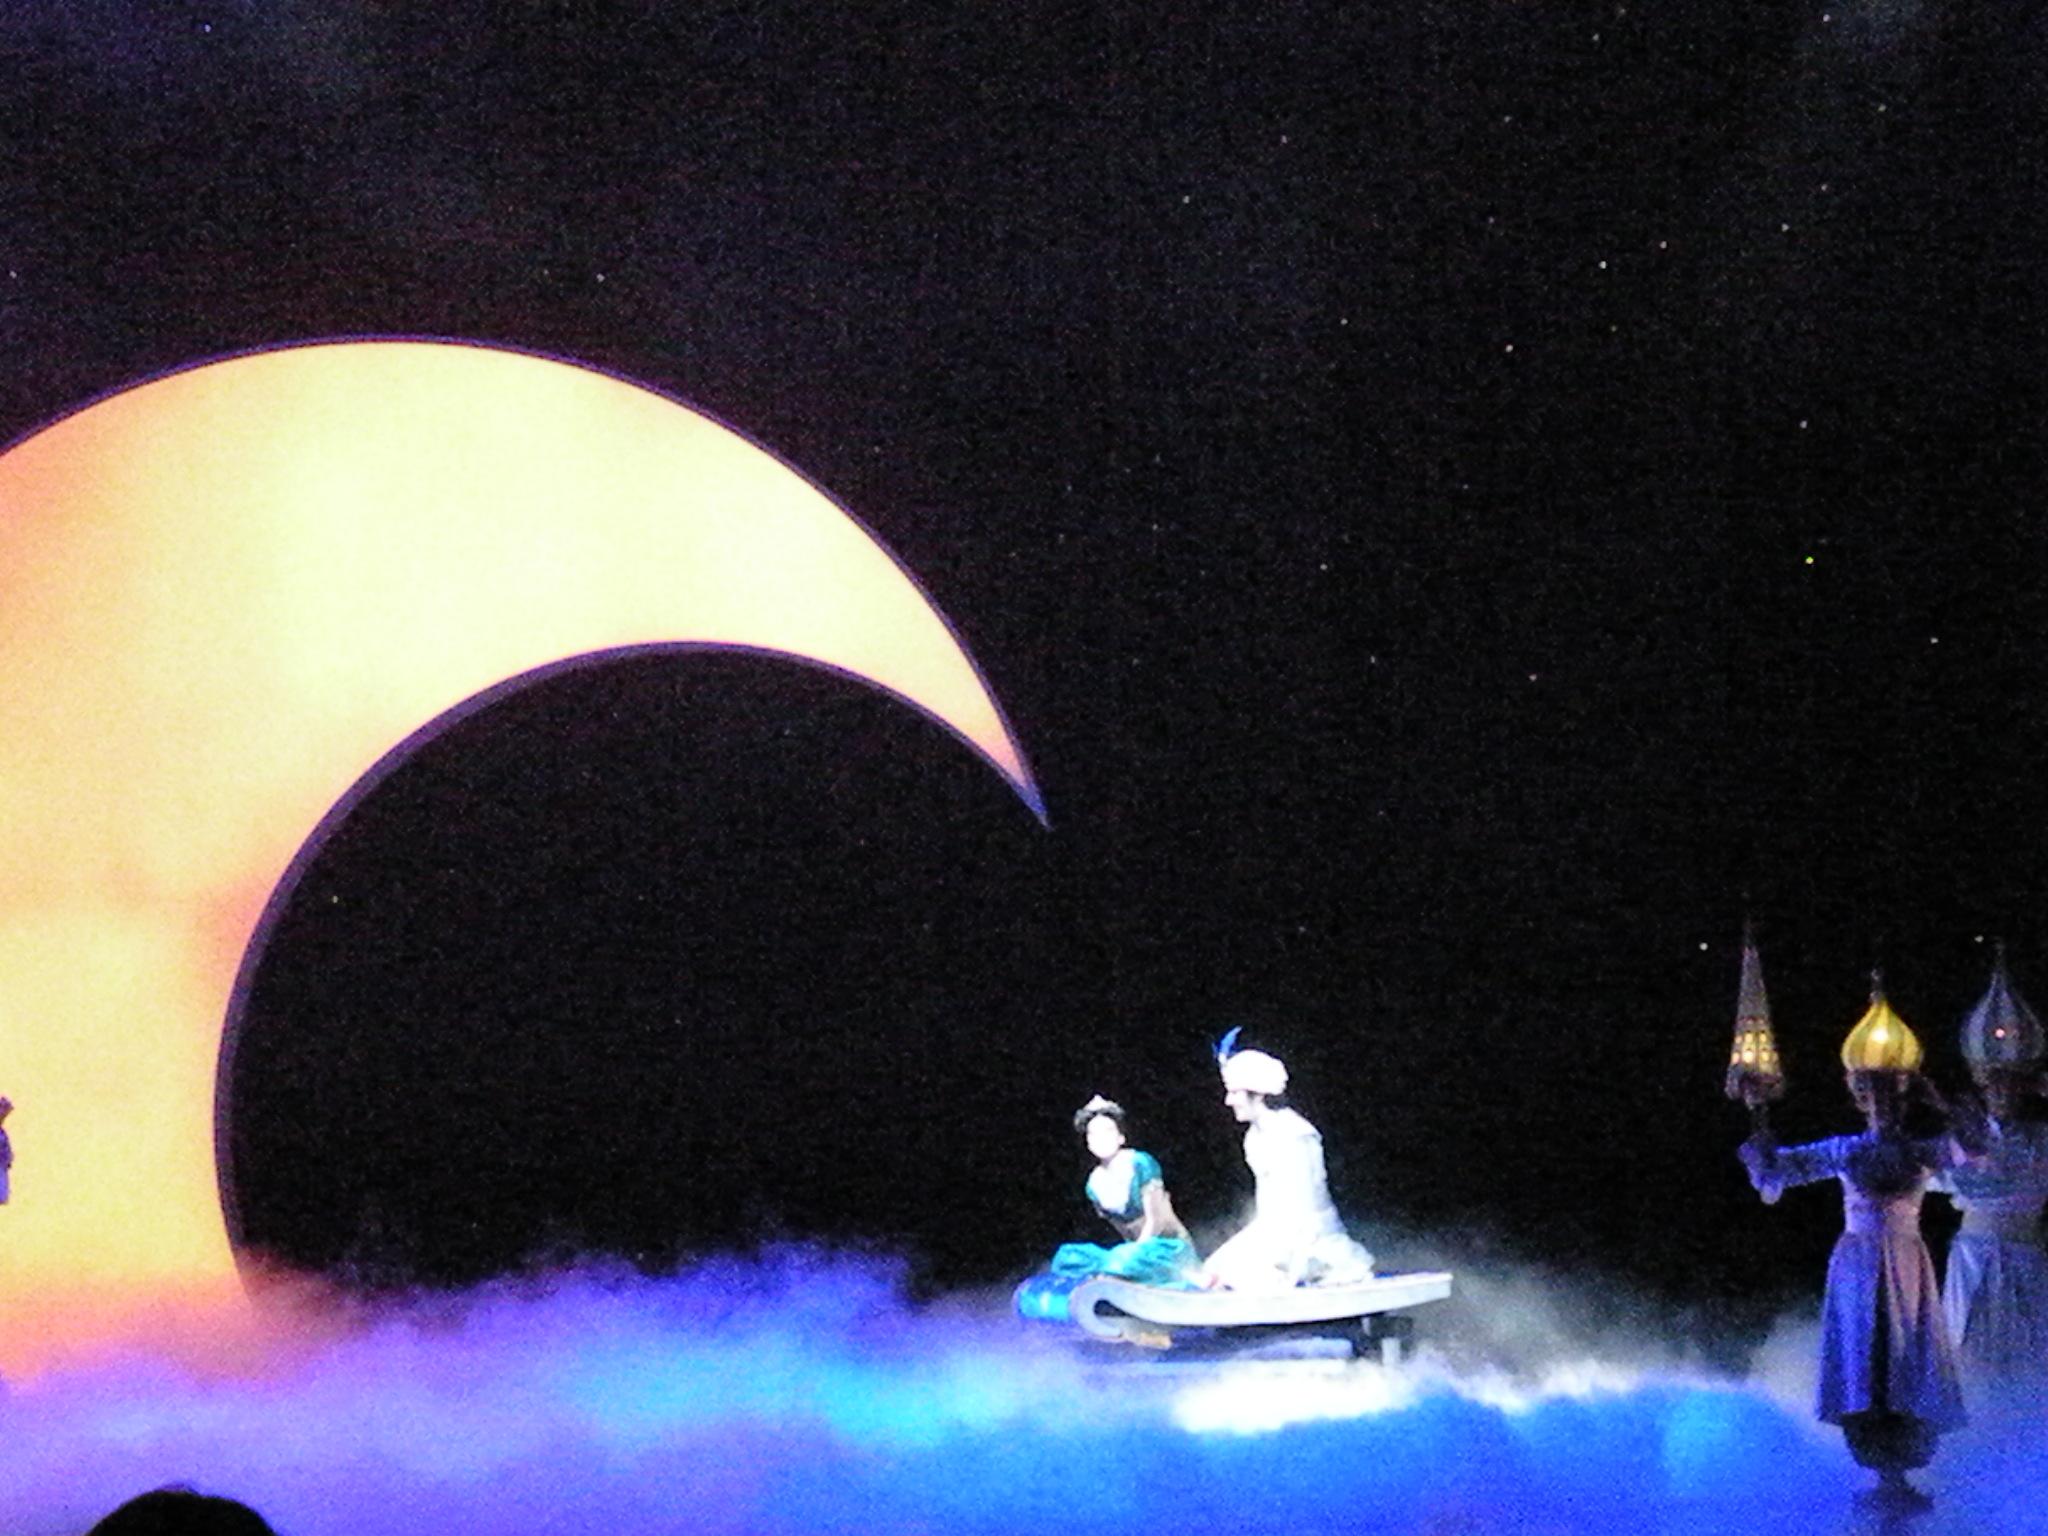 Prince Ali and Jasmine take a magic carpet ride through the theater.